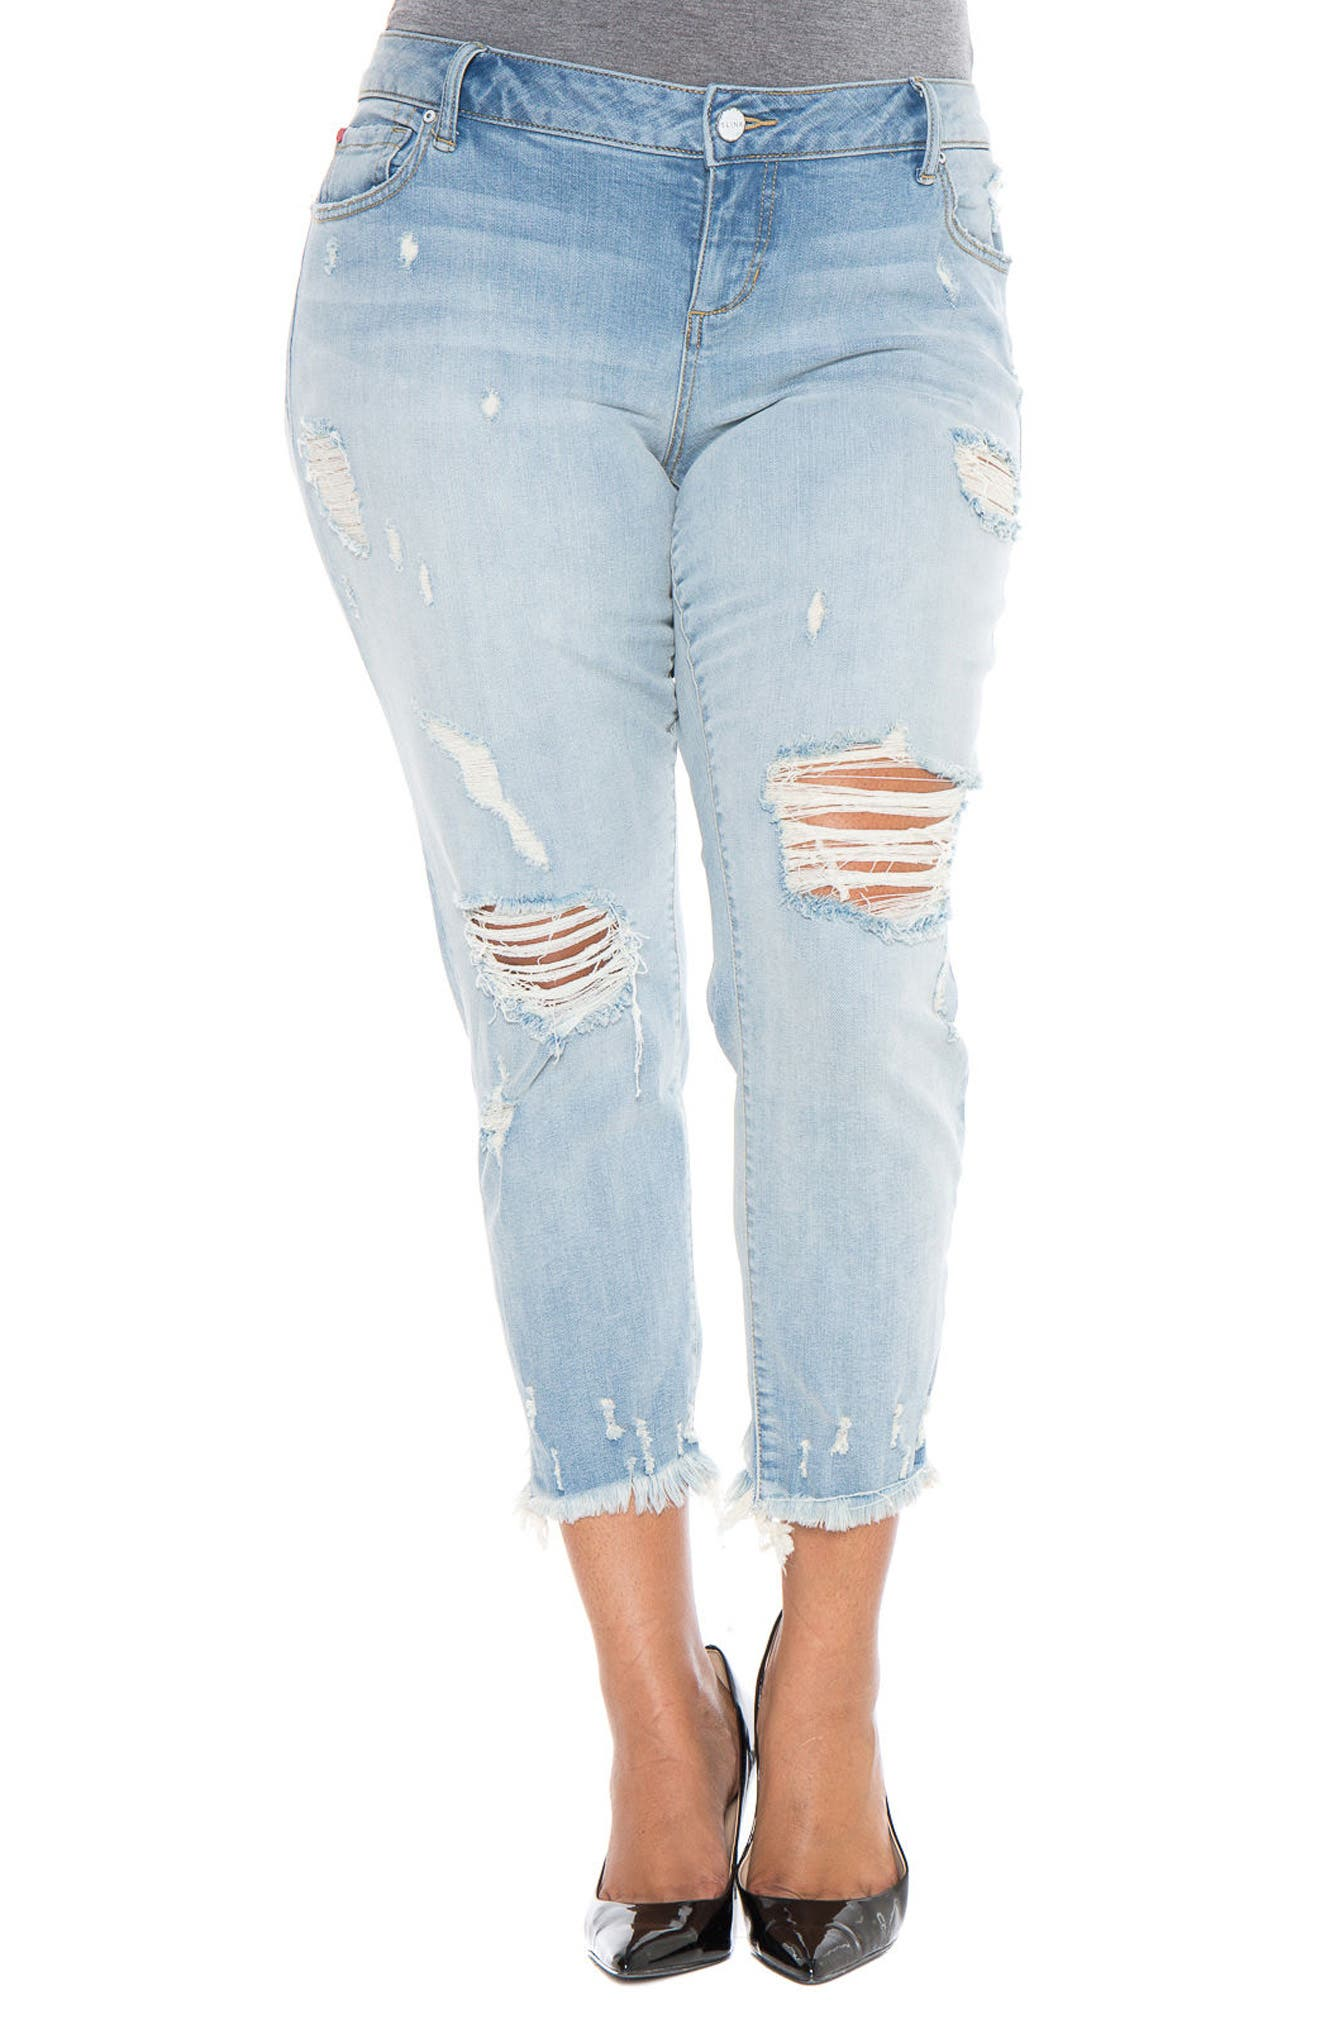 Main Image - SLINK Jeans Frayed Hem Ripped Boyfriend Jeans (Maggie) (Plus Size)